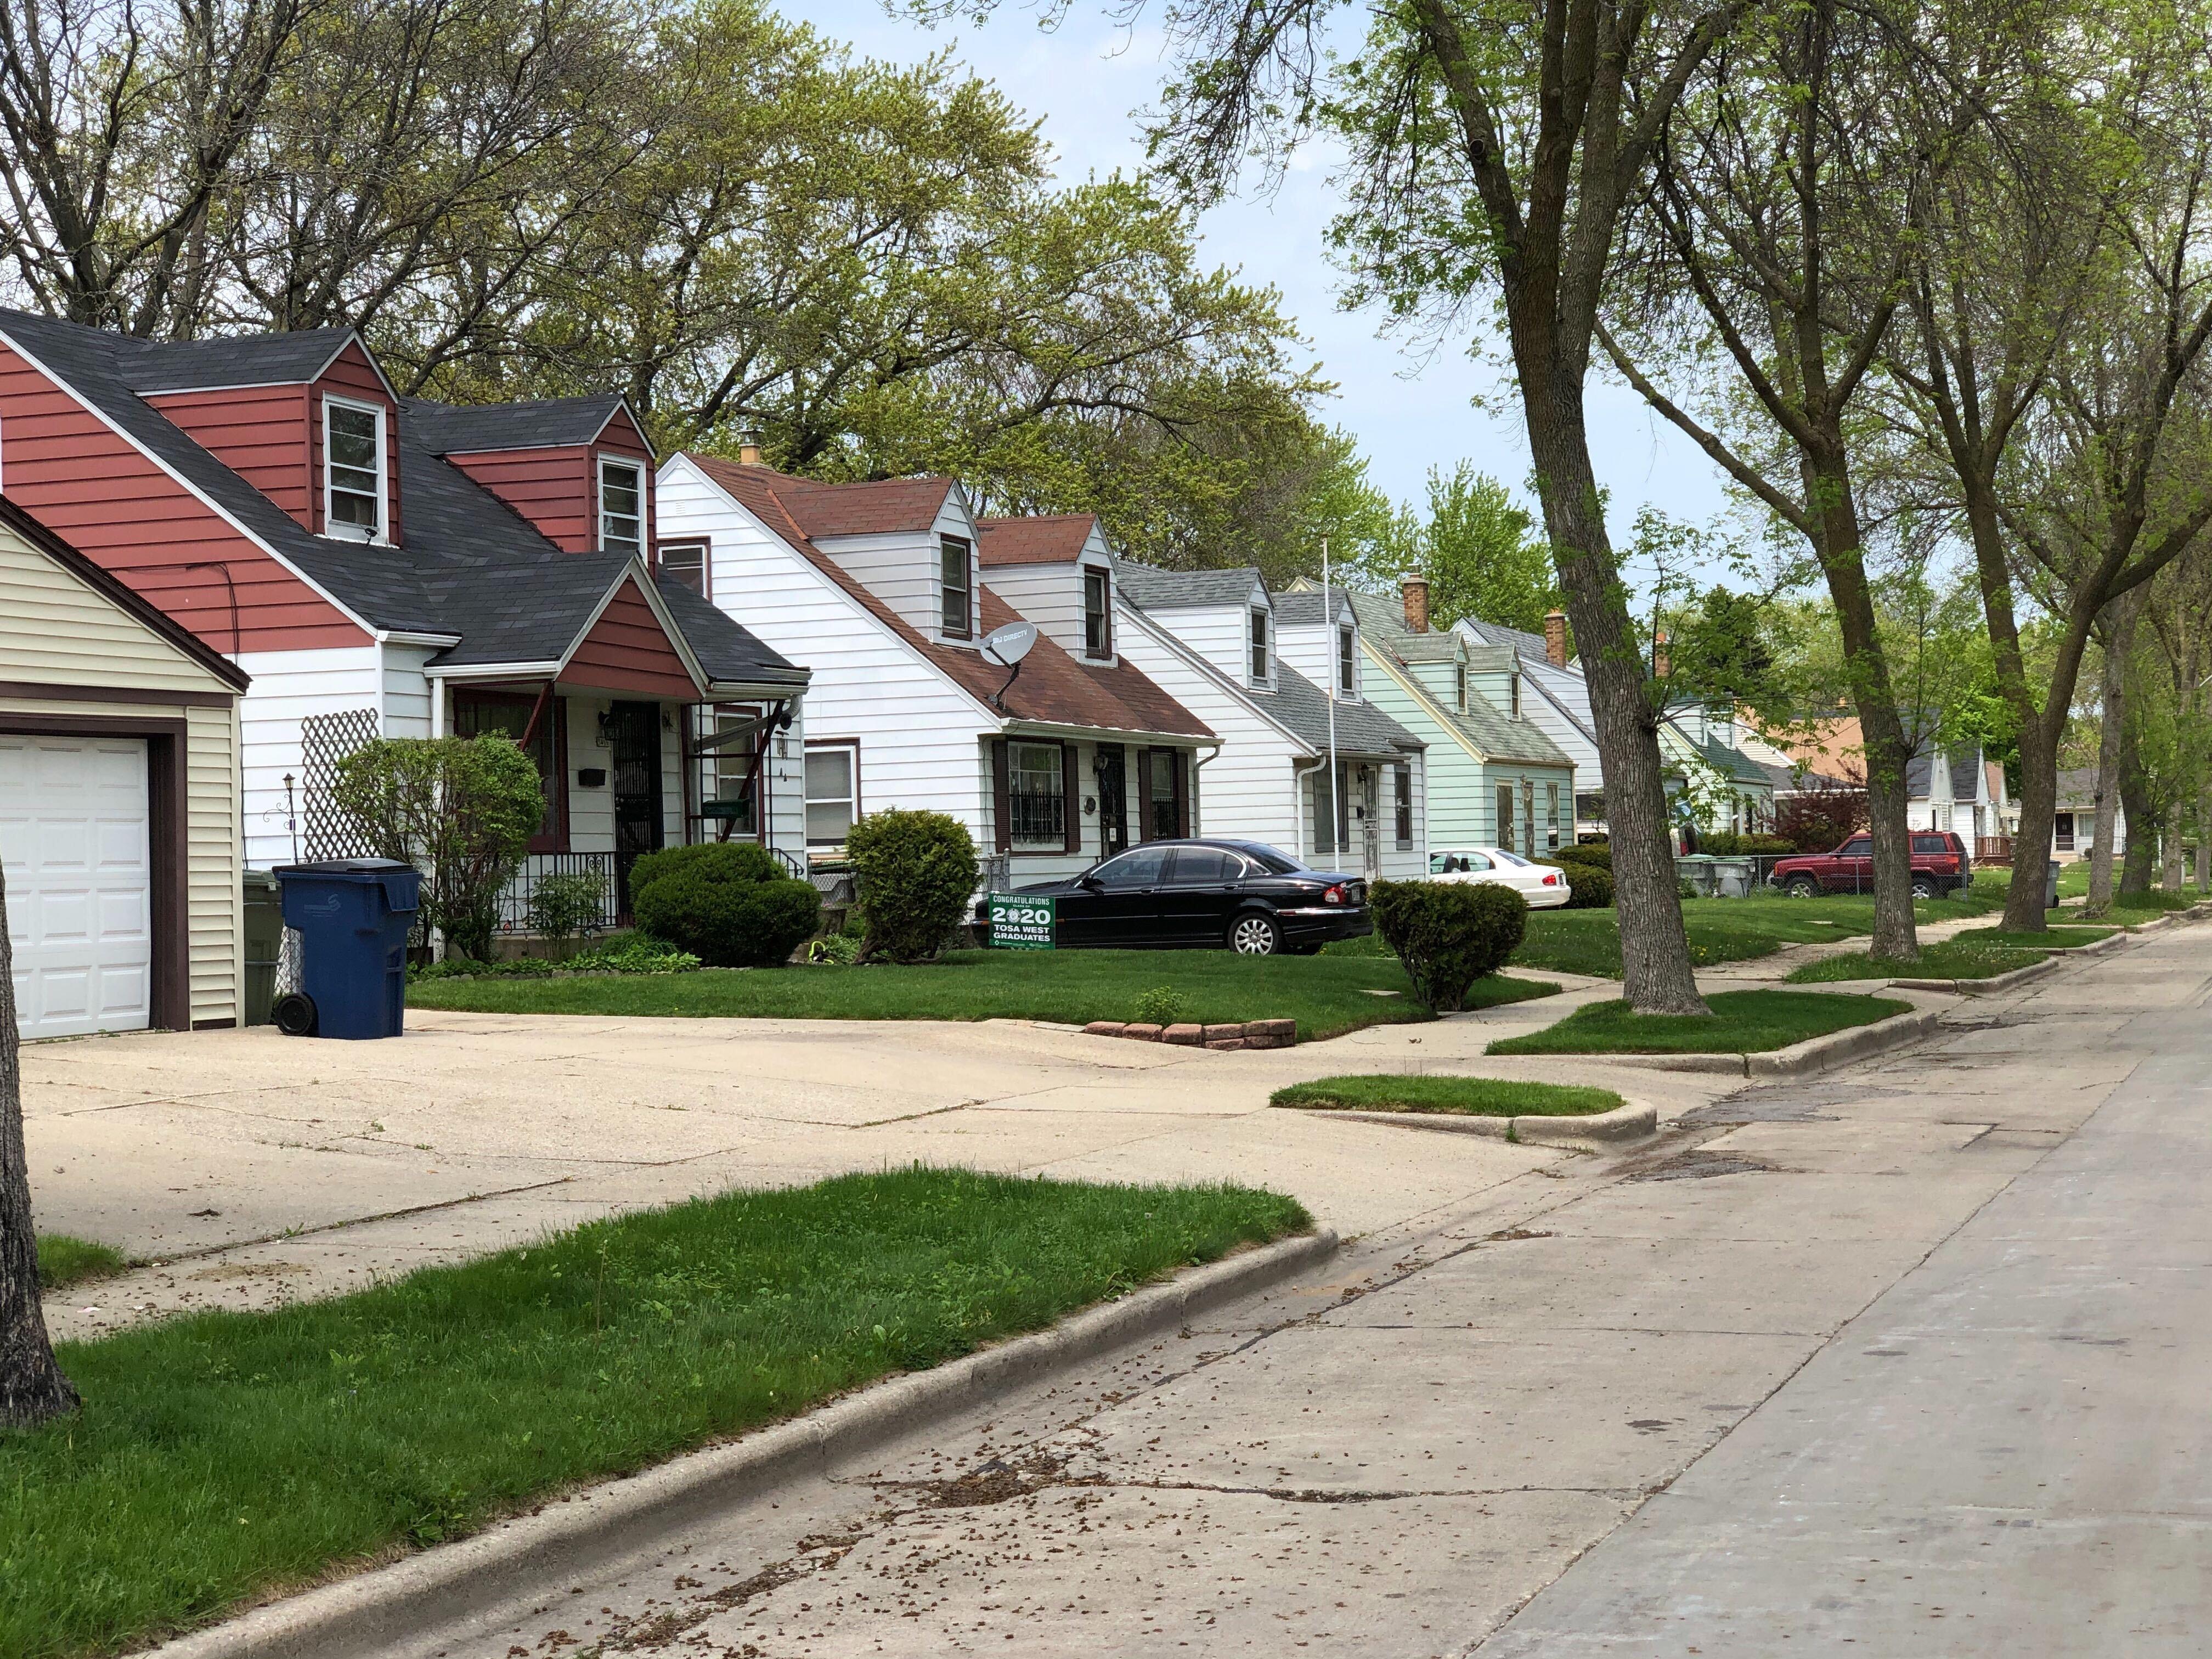 Homes on N. 56th St. Photo by Jeramey Jannene.